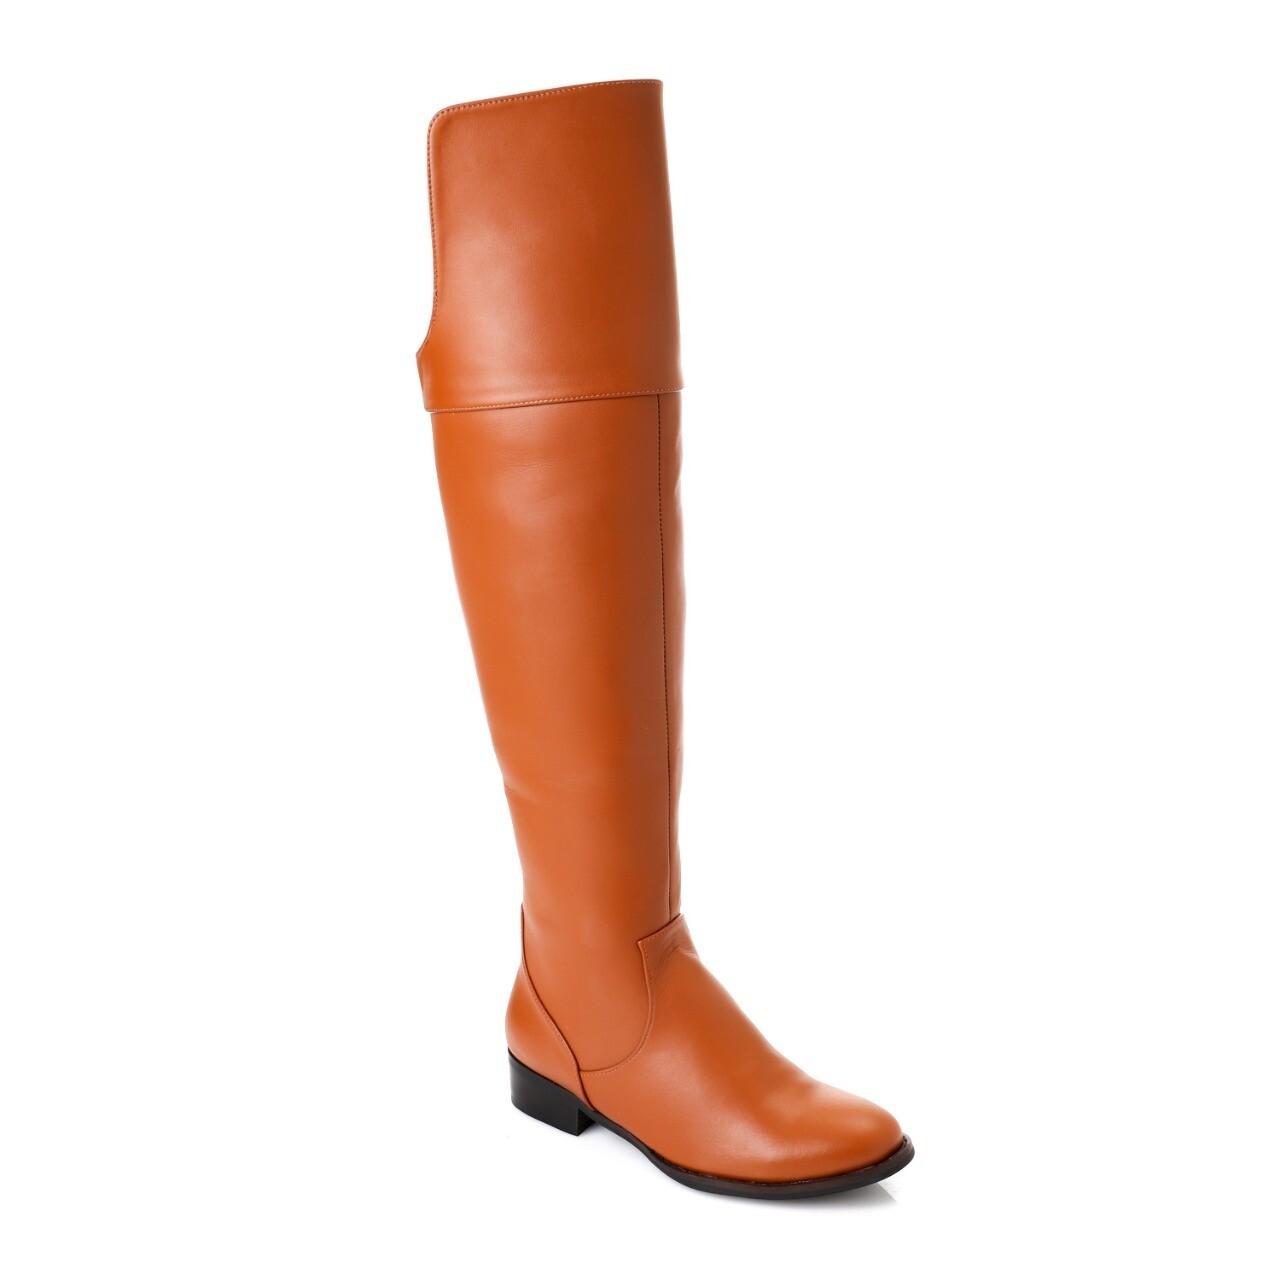 3747 Knee High Boot - Camel